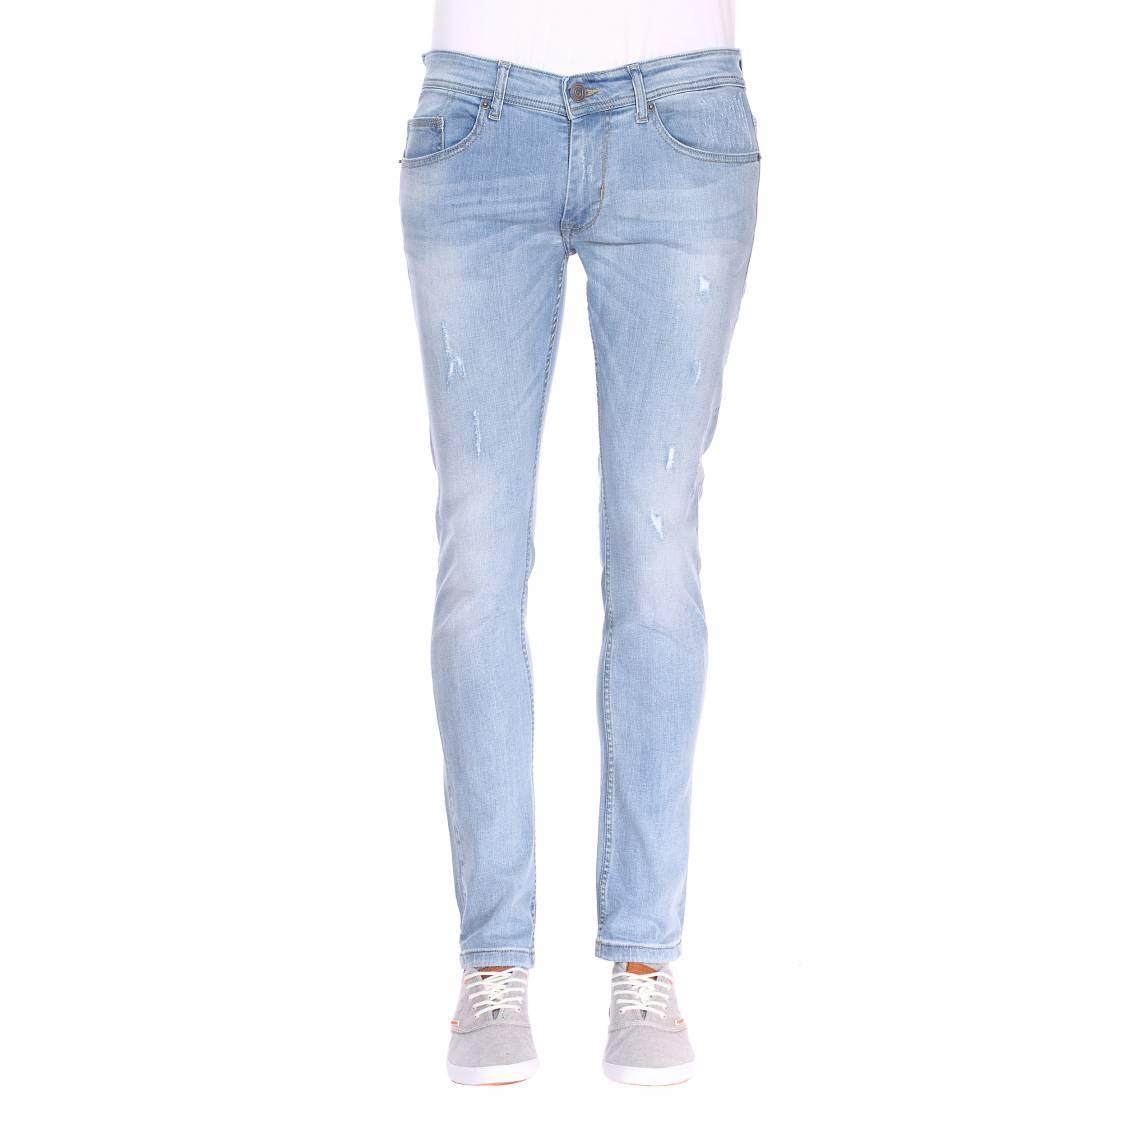 Bleu Rue Des Jean Clair Hommes Coton Stretch Bruce Gaudi Skinny En wzpzT8Yq